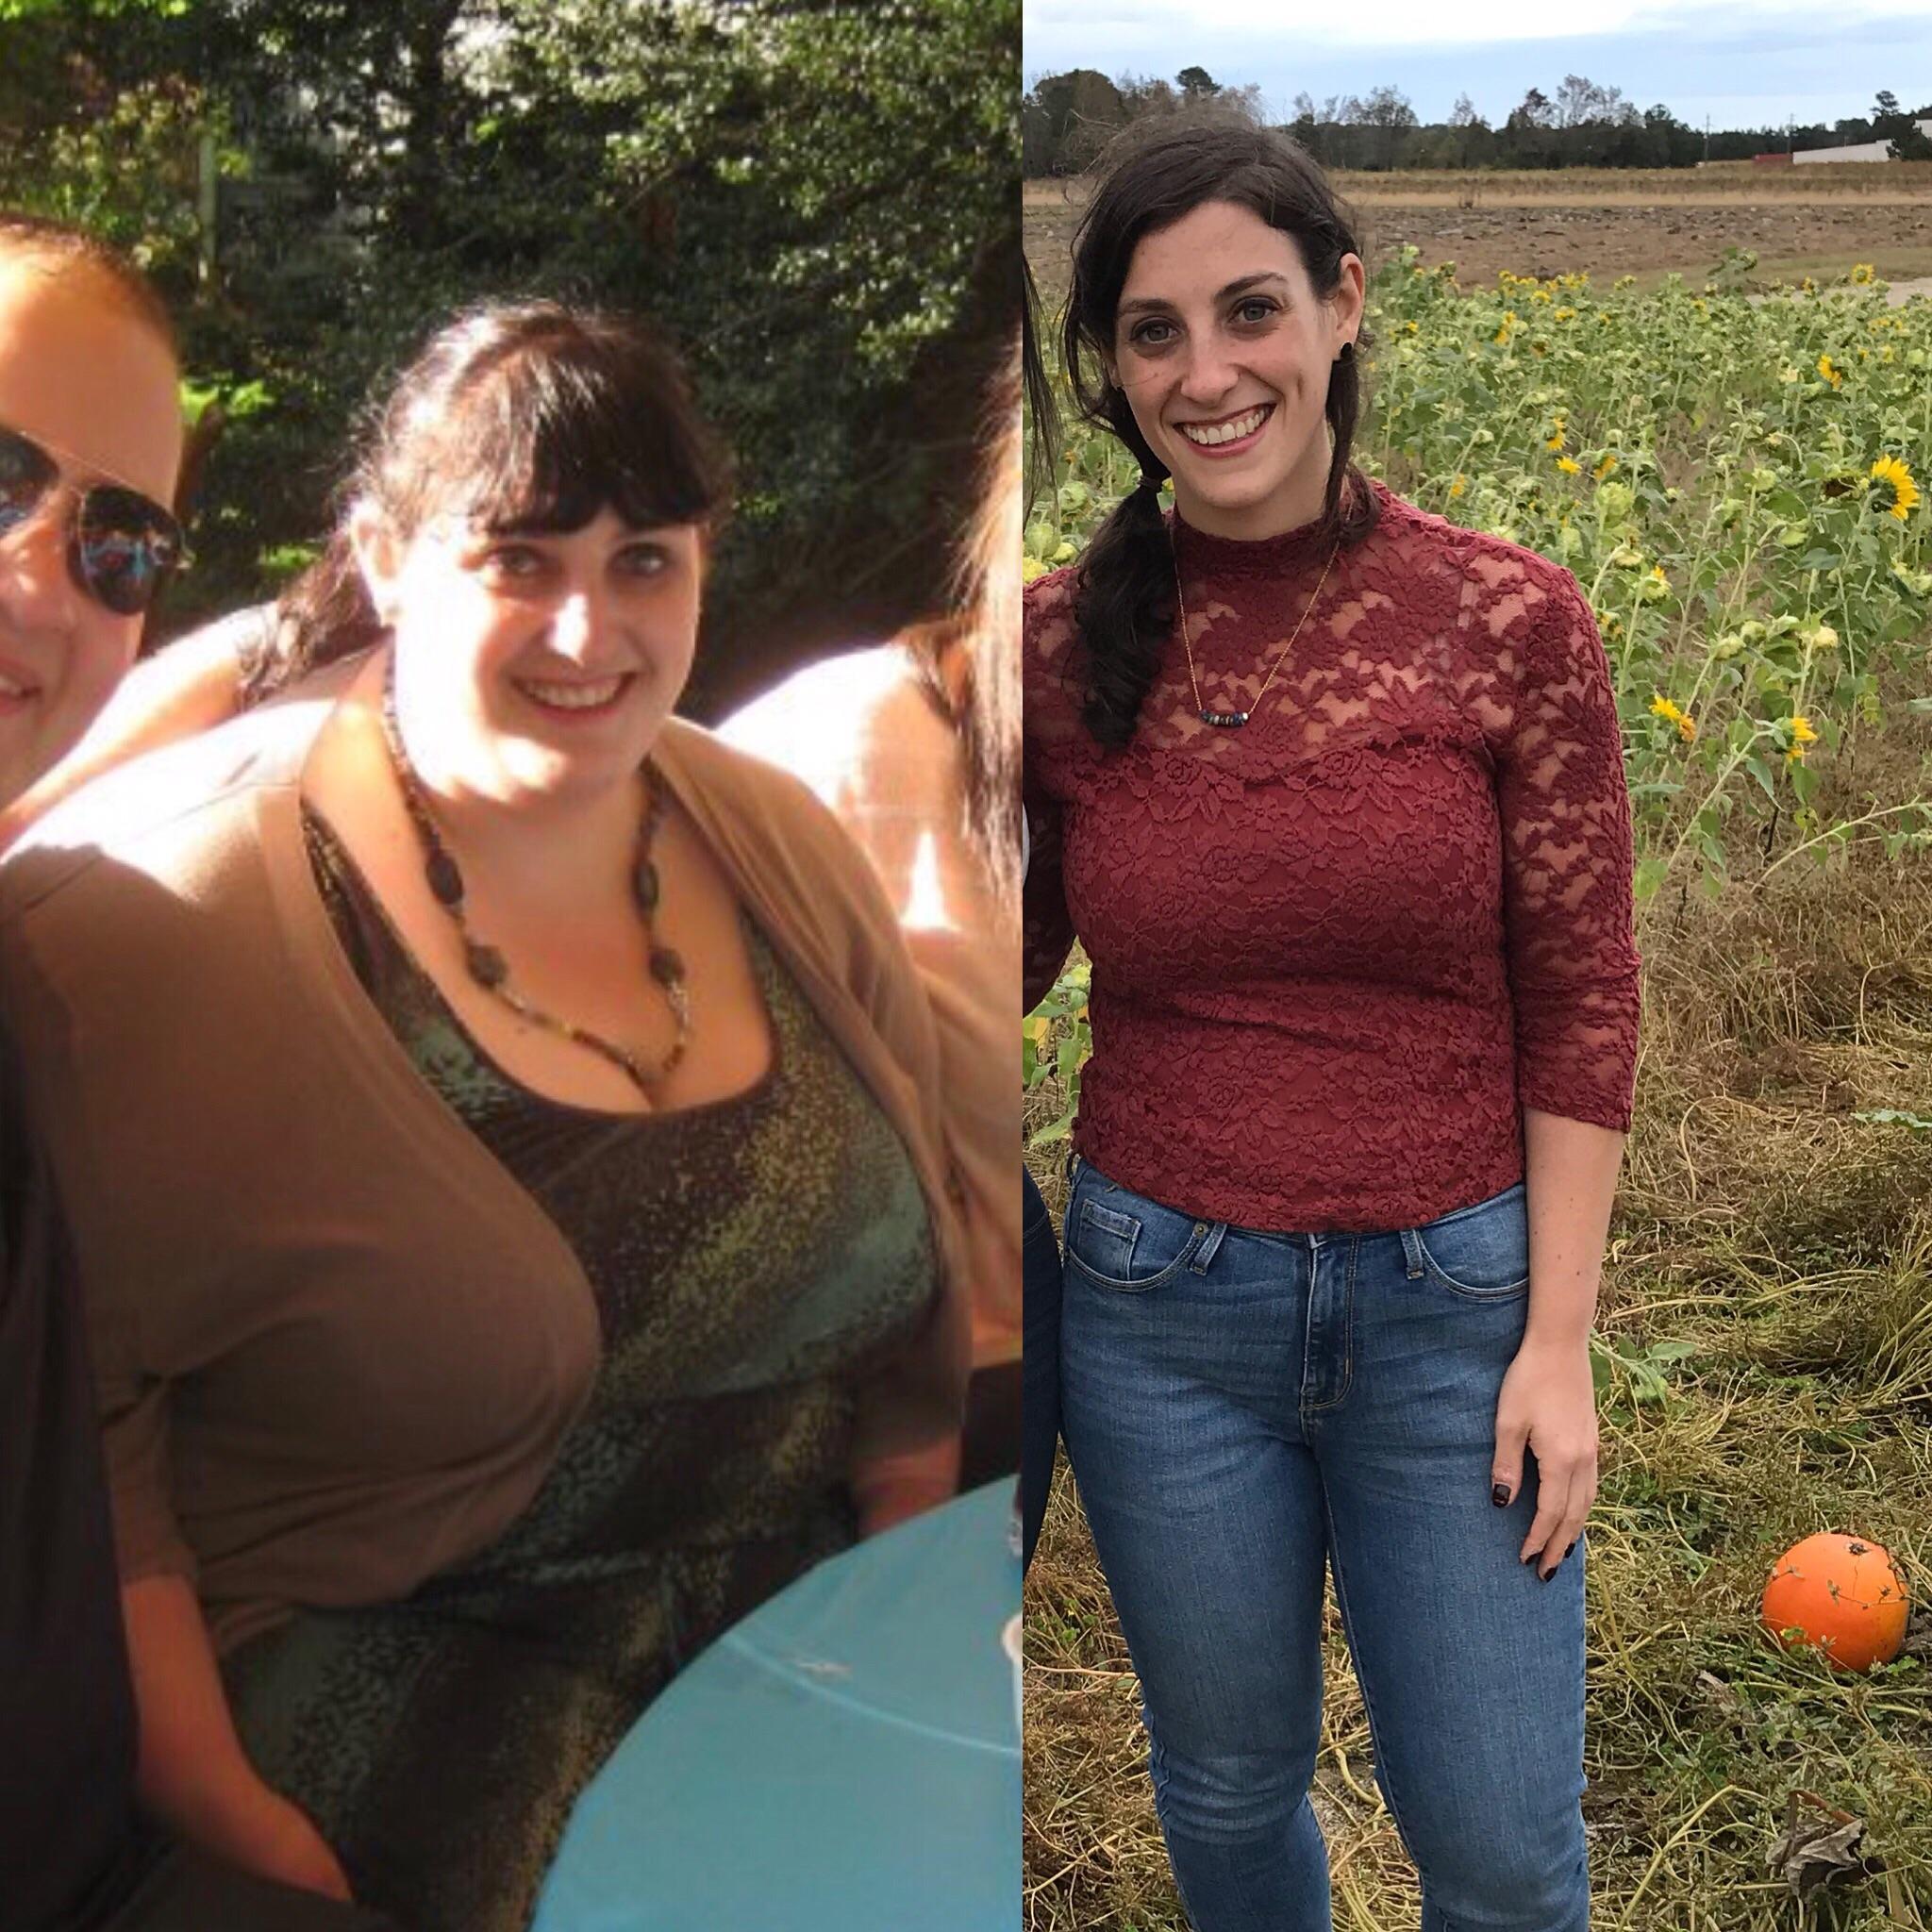 Progress Pics of 128 lbs Weight Loss 5'4 Female 278 lbs to 150 lbs